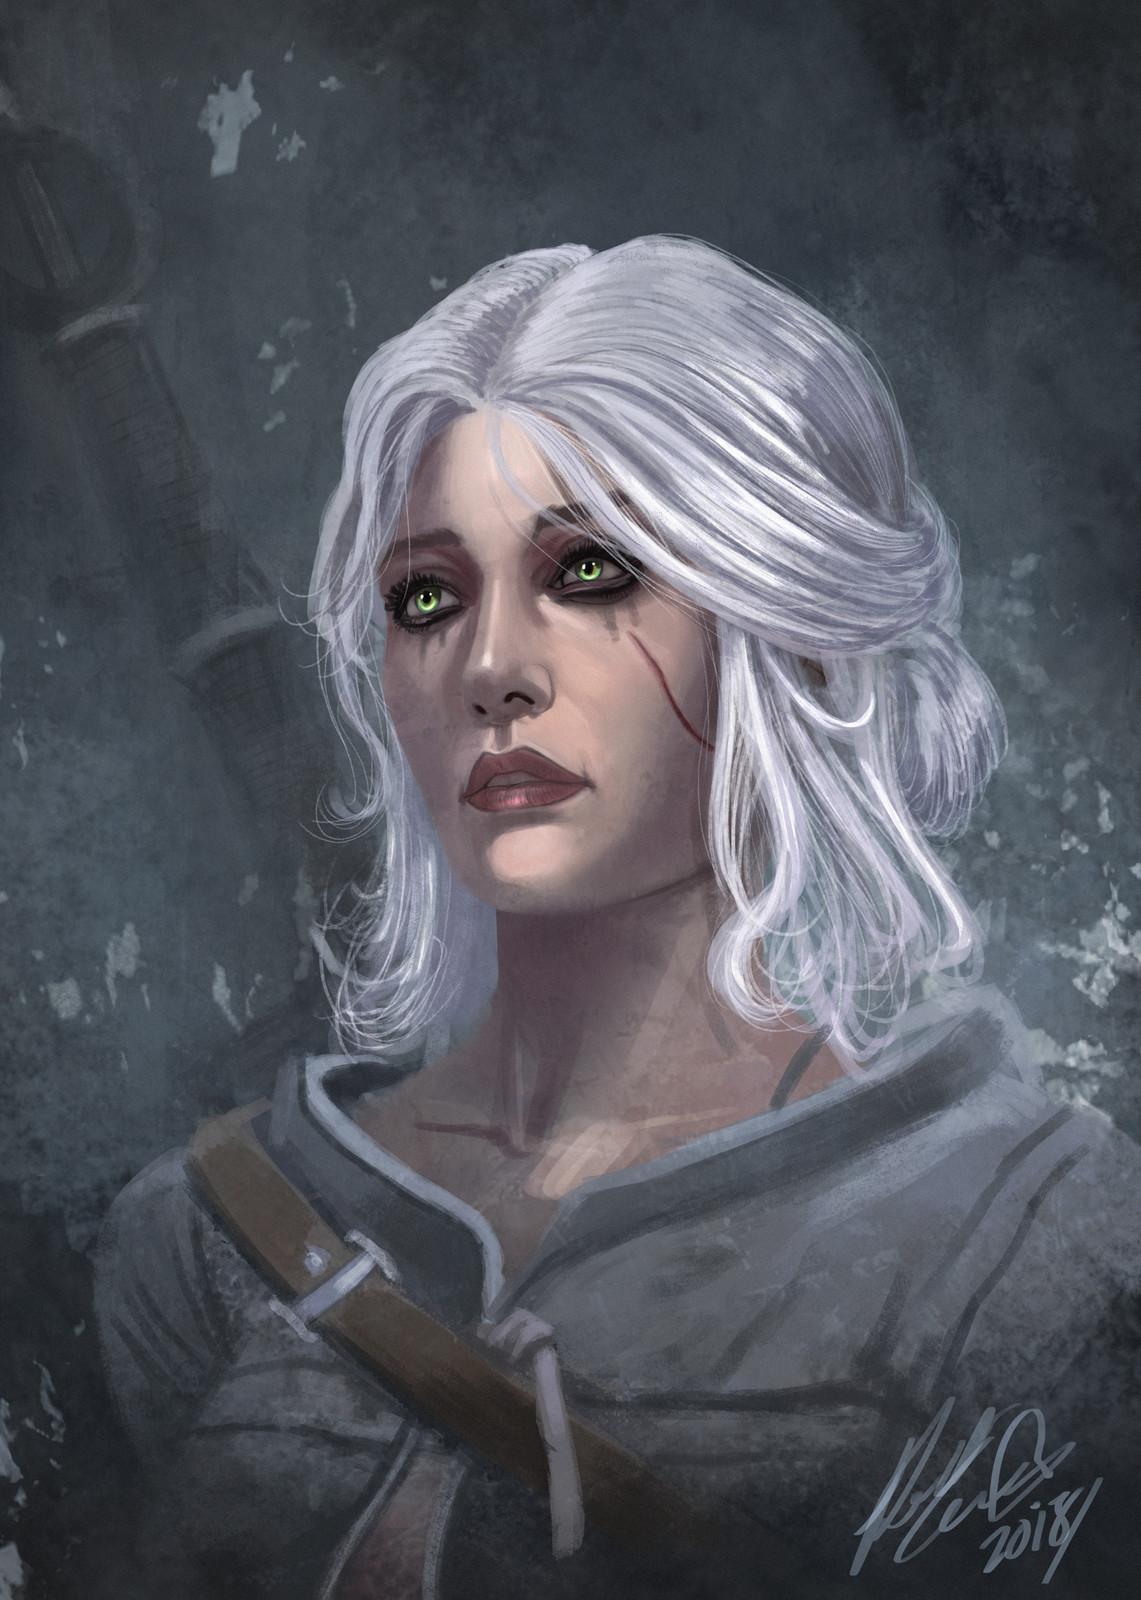 Ciri - Witcher 3 Fan art